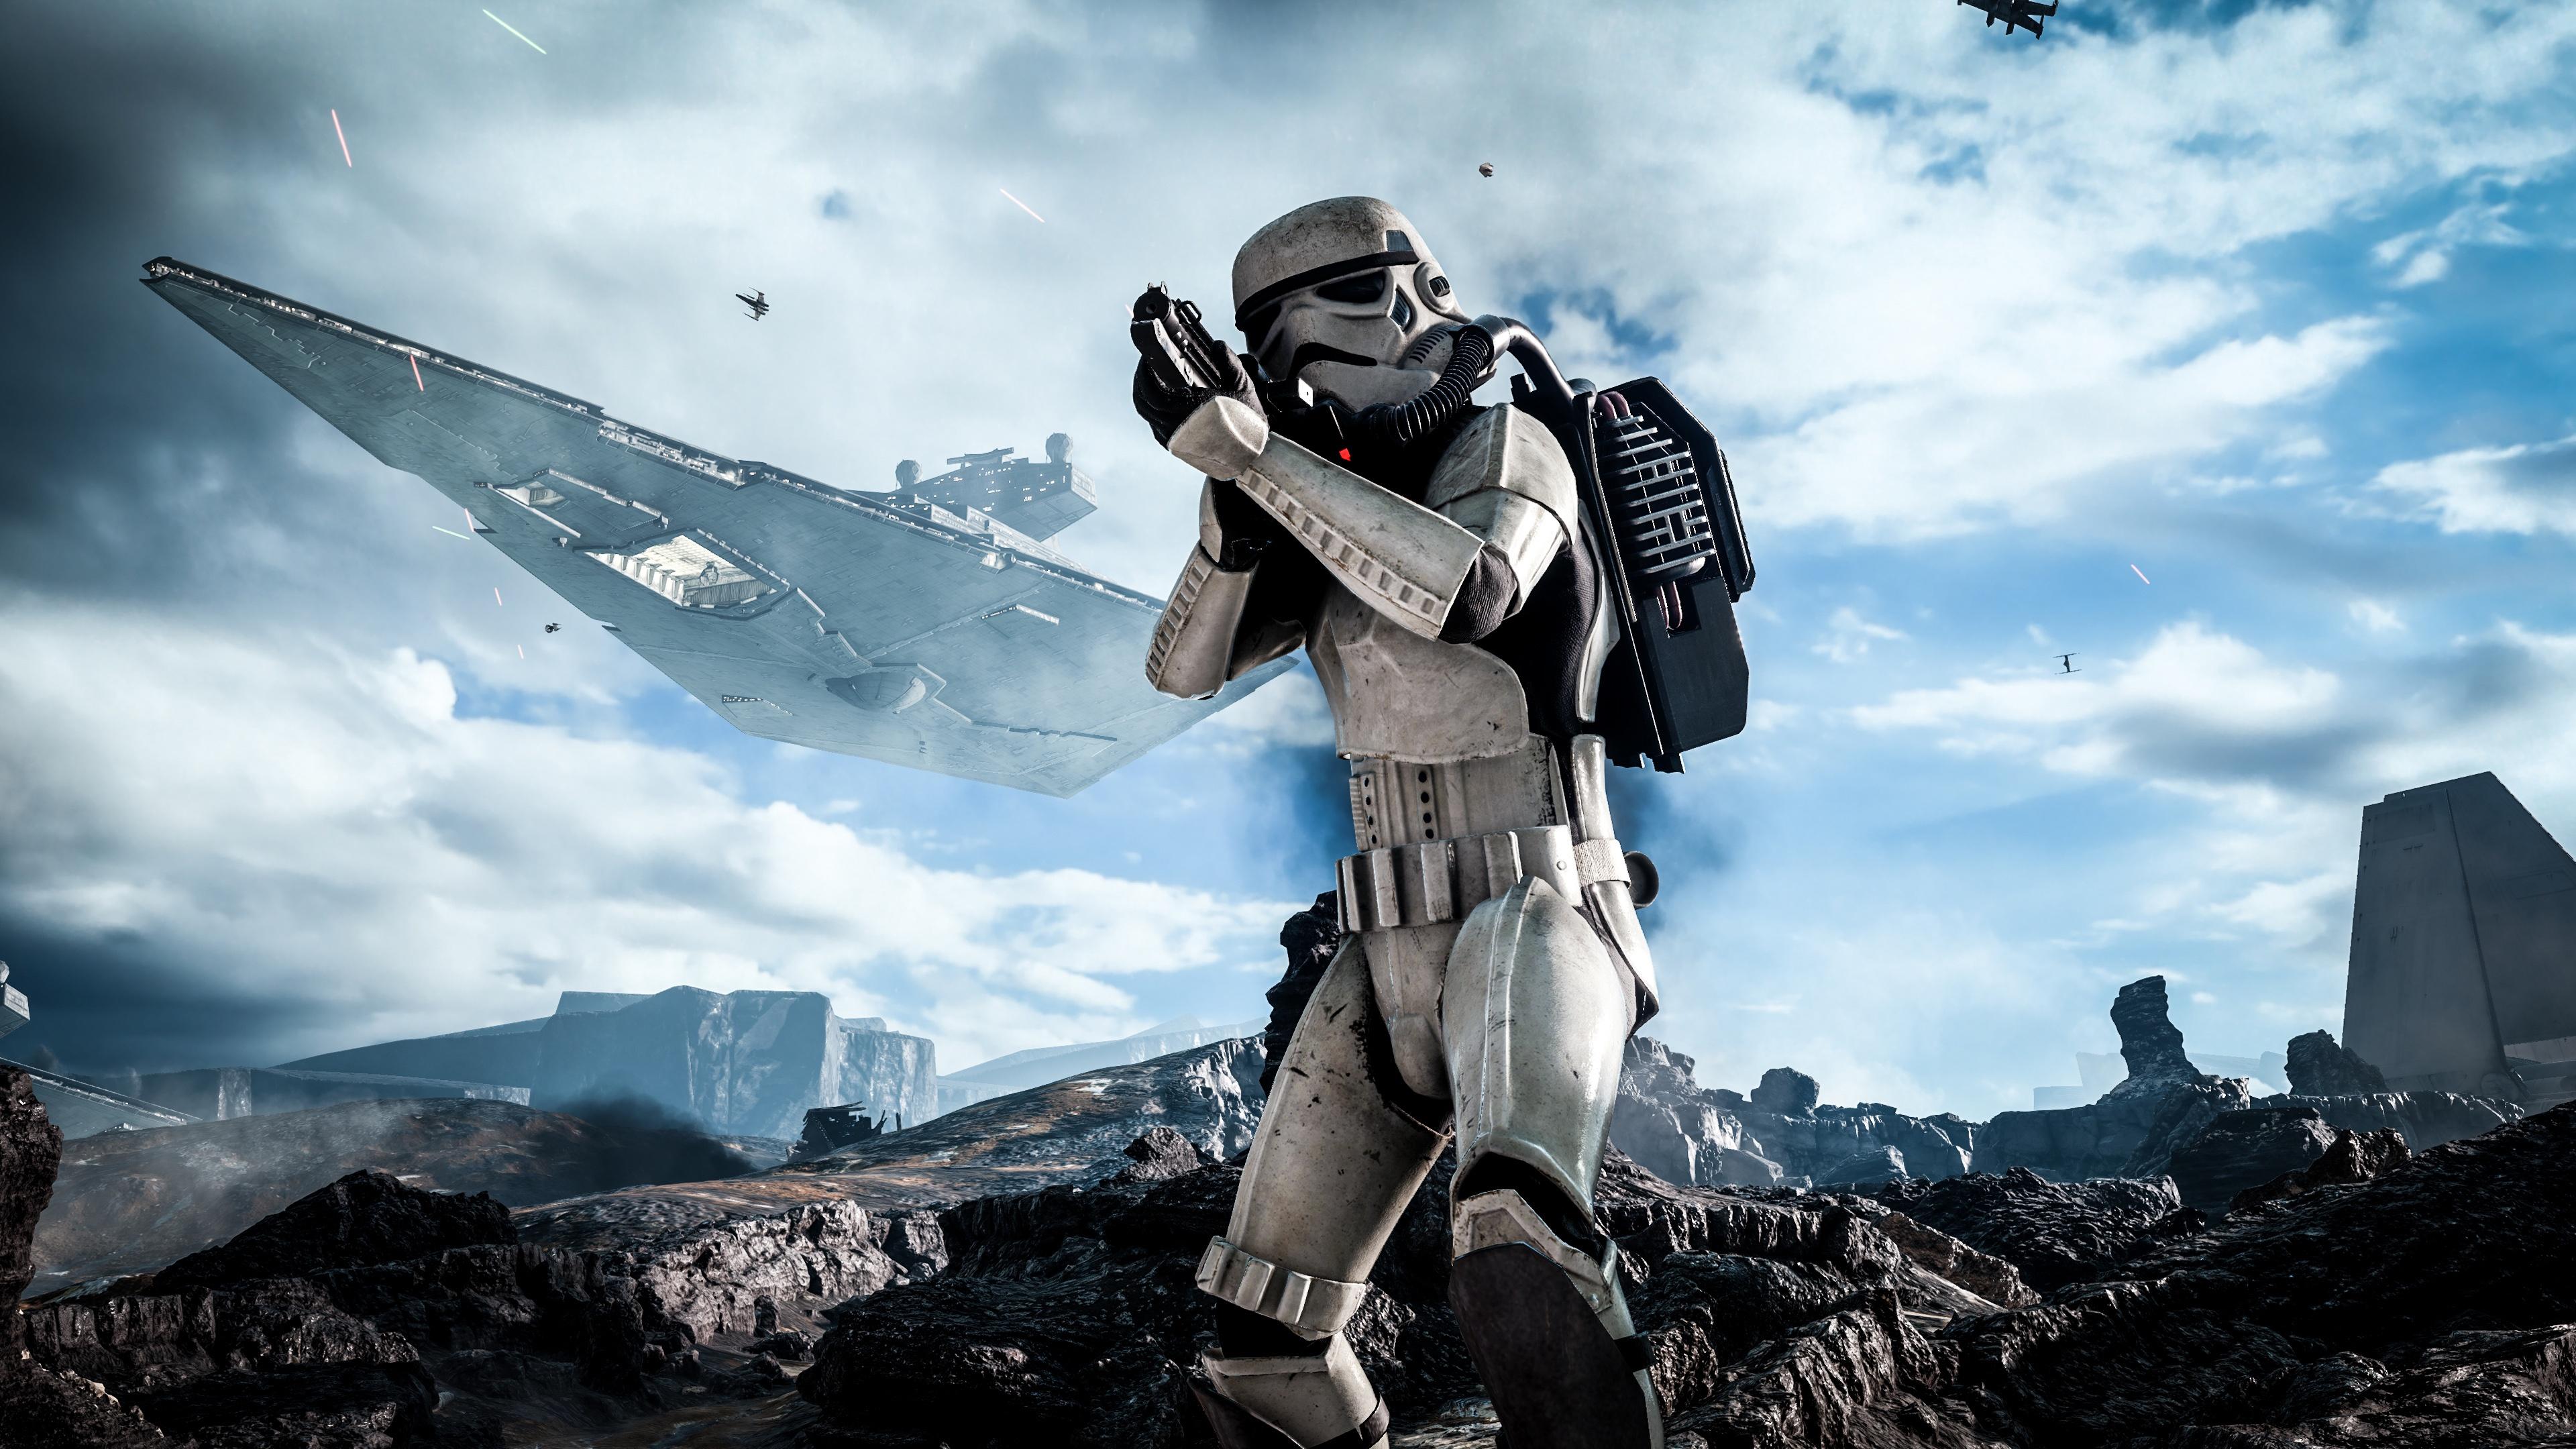 Star Wars Battlefront Stormtrooper Wallpapers In Jpg Format For Free